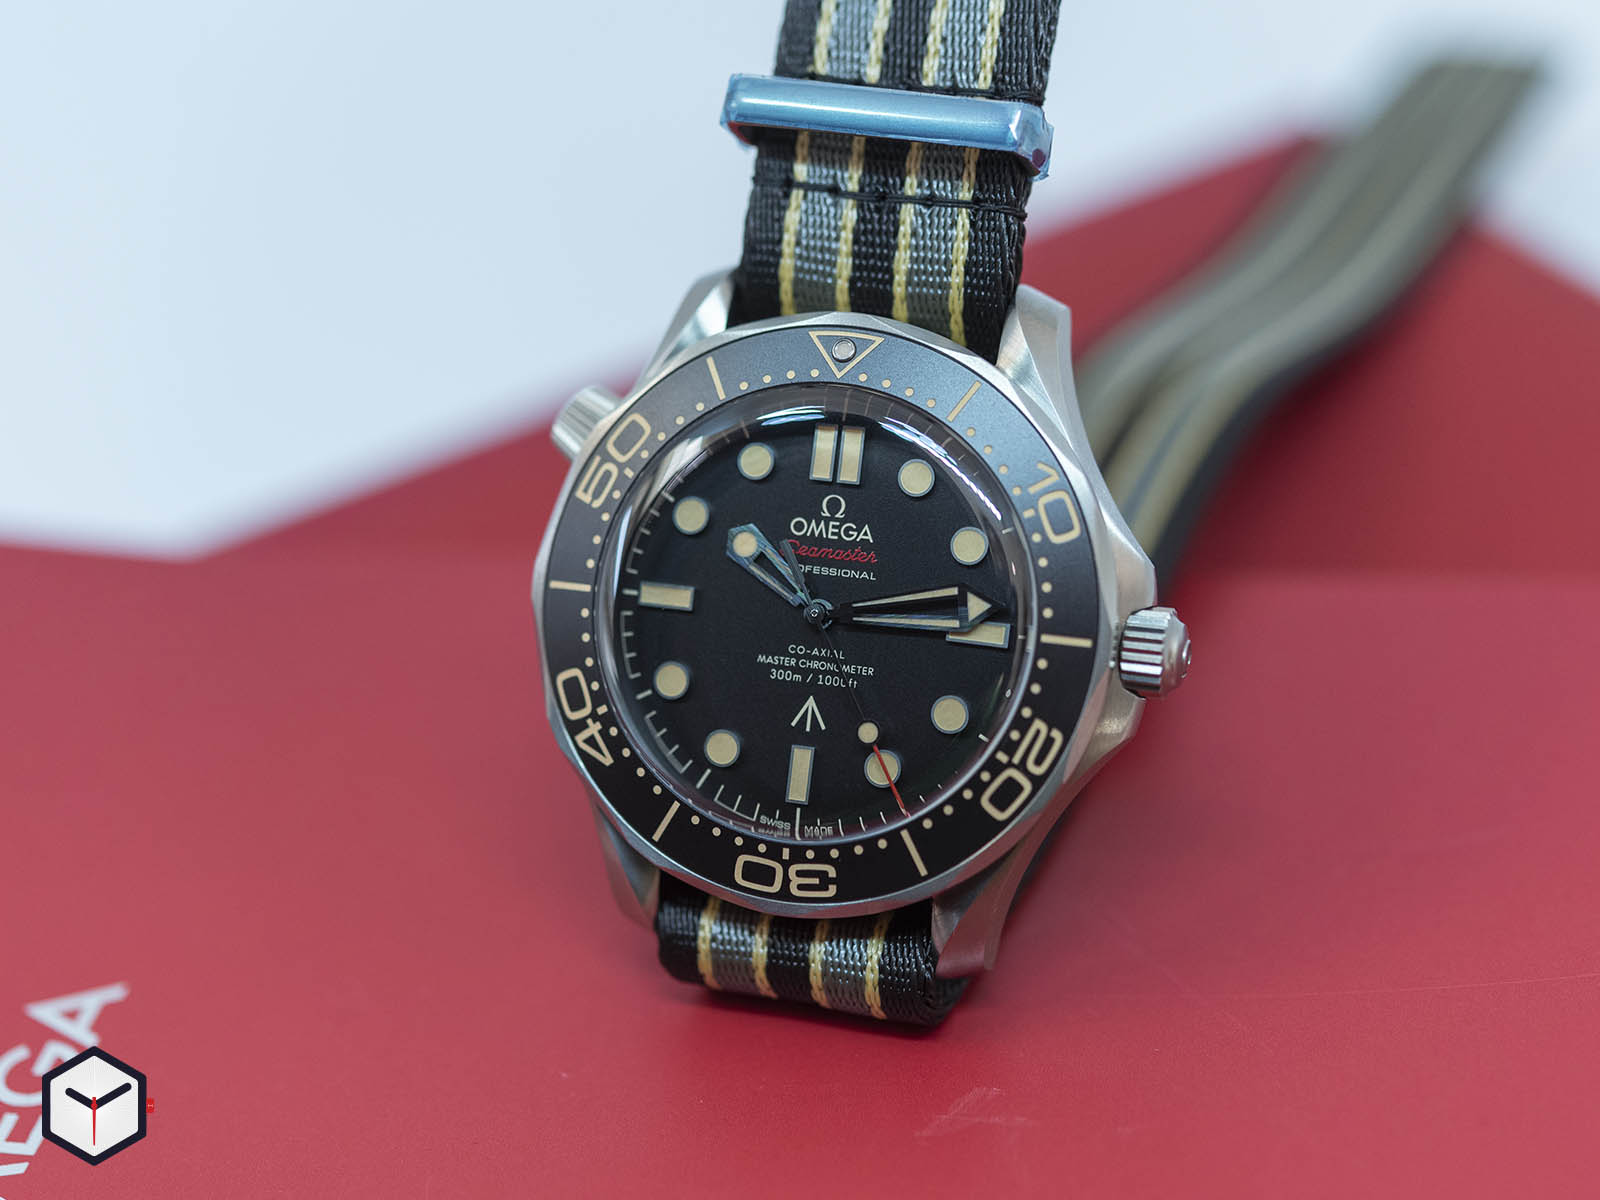 210-92-42-20-01-001-omega-seamaster-diver-300m-007-edition-3-.jpg